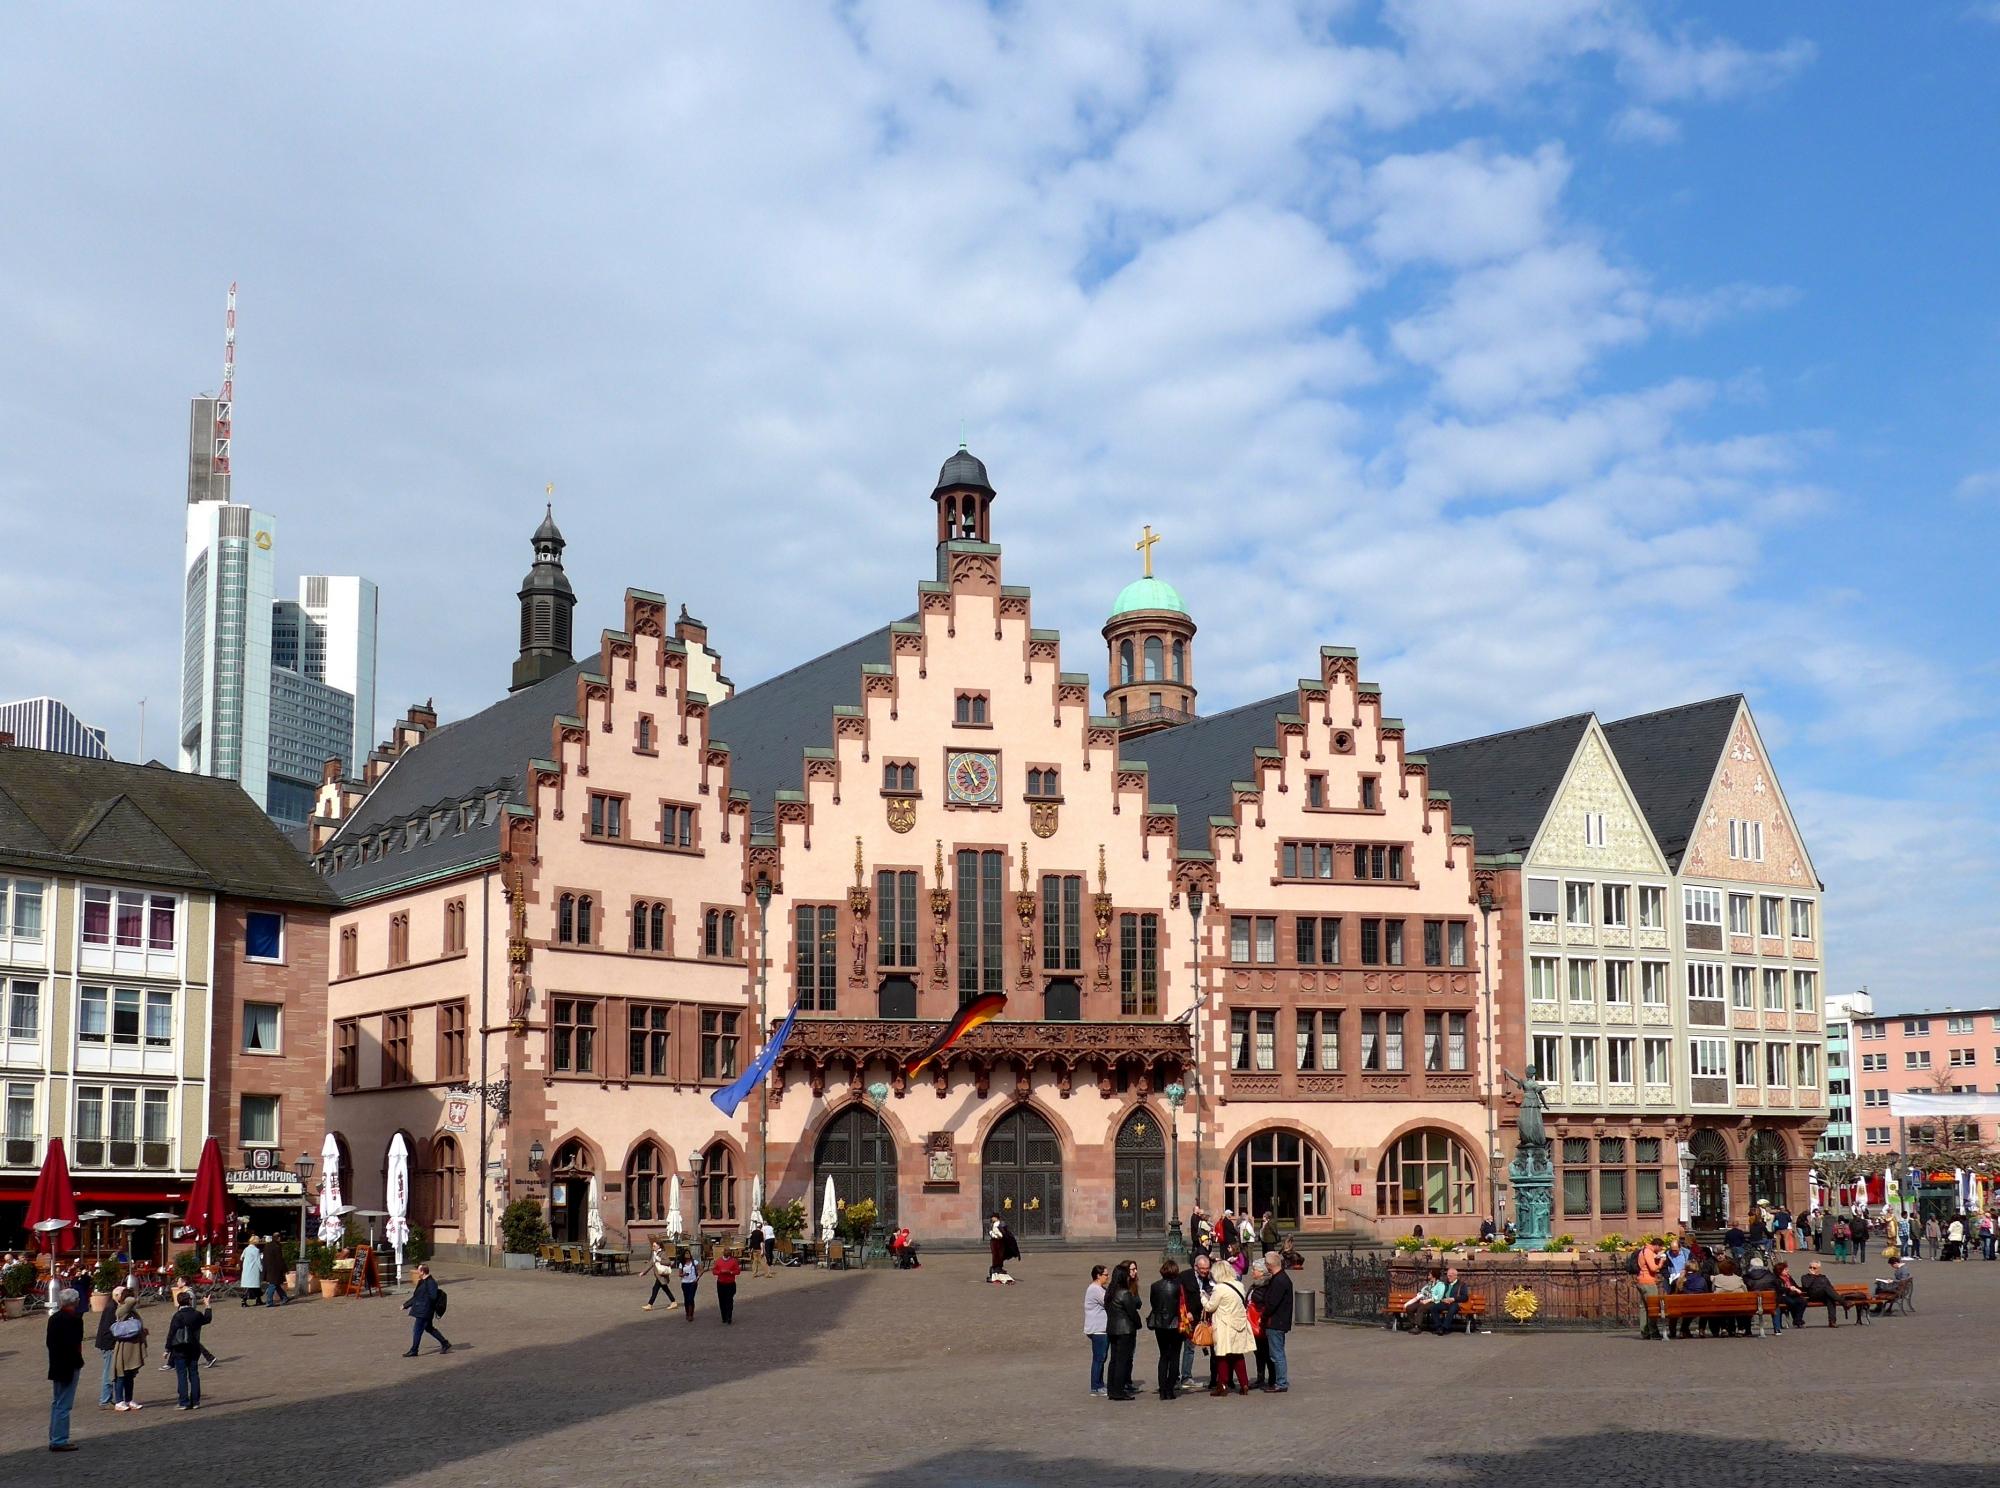 The Römer Building in Frankfurt am Main, Germany